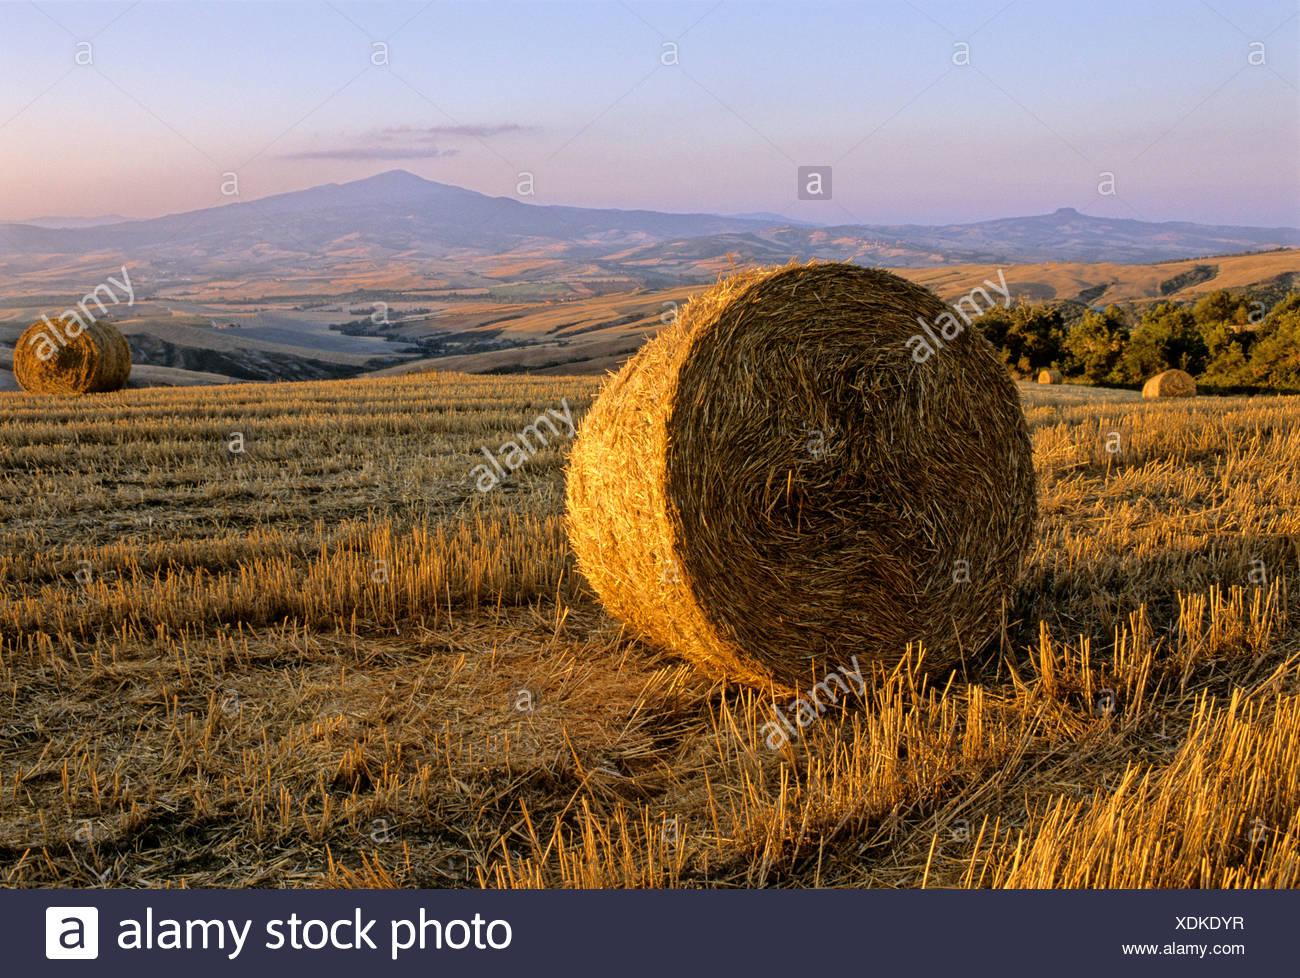 Bale of straw, harvested wheatfields, landscape around Radicofani and Monte Amiata at sunset, Val d' Orcia near Monticchiello,  - Stock Image